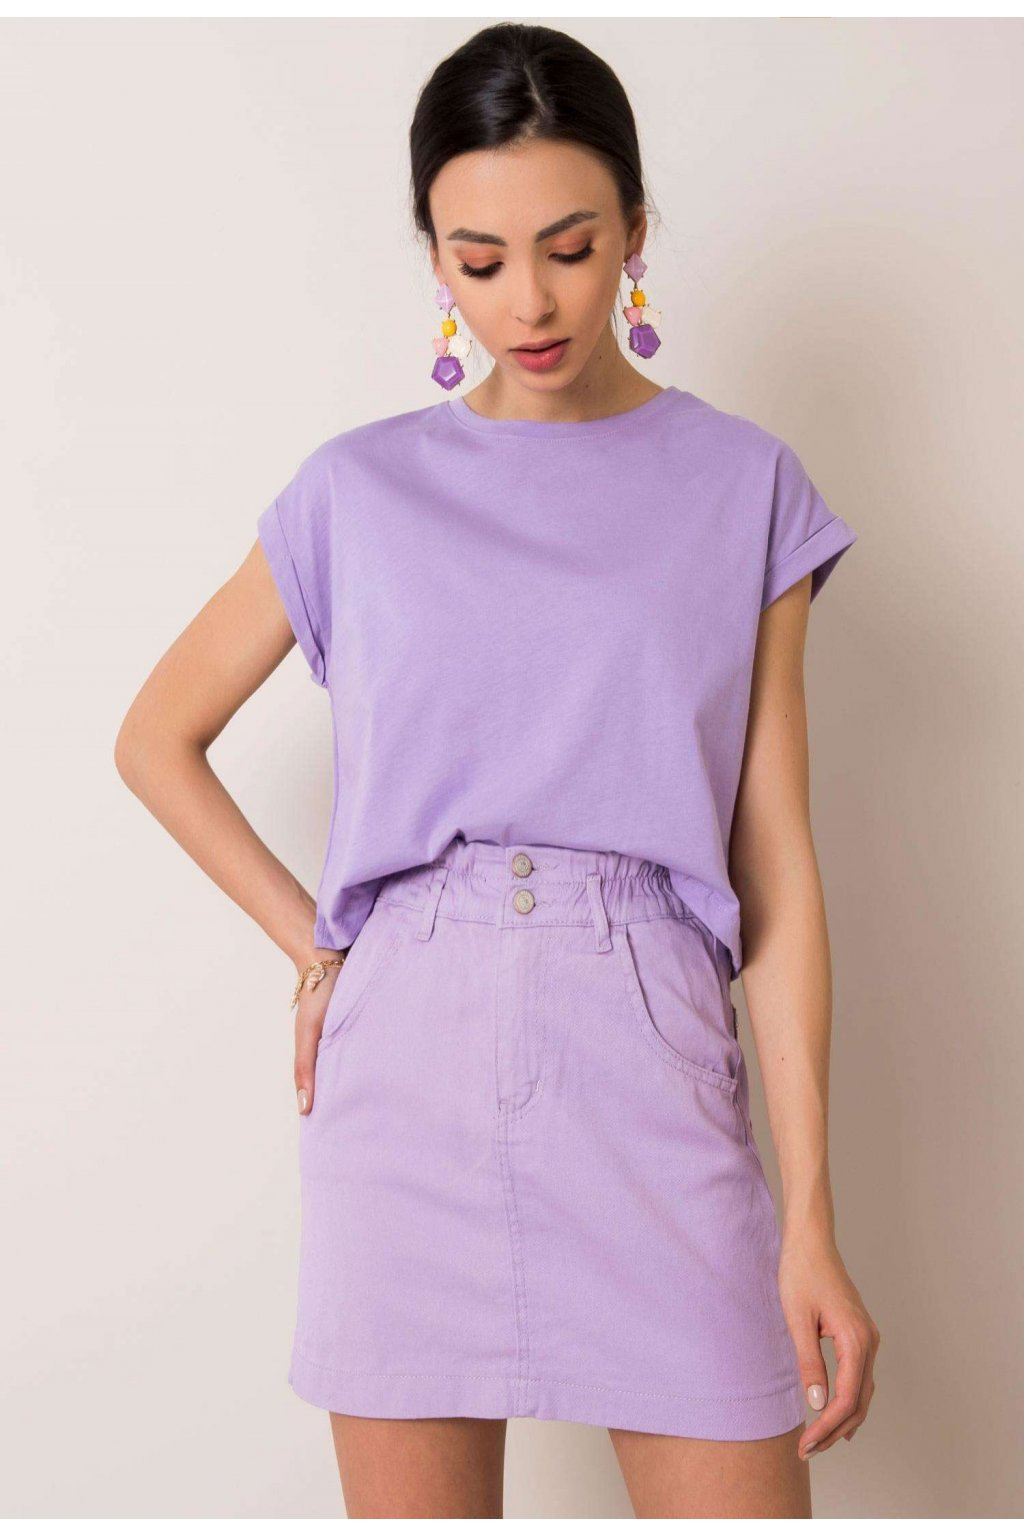 Fialová dámska riflová sukňa